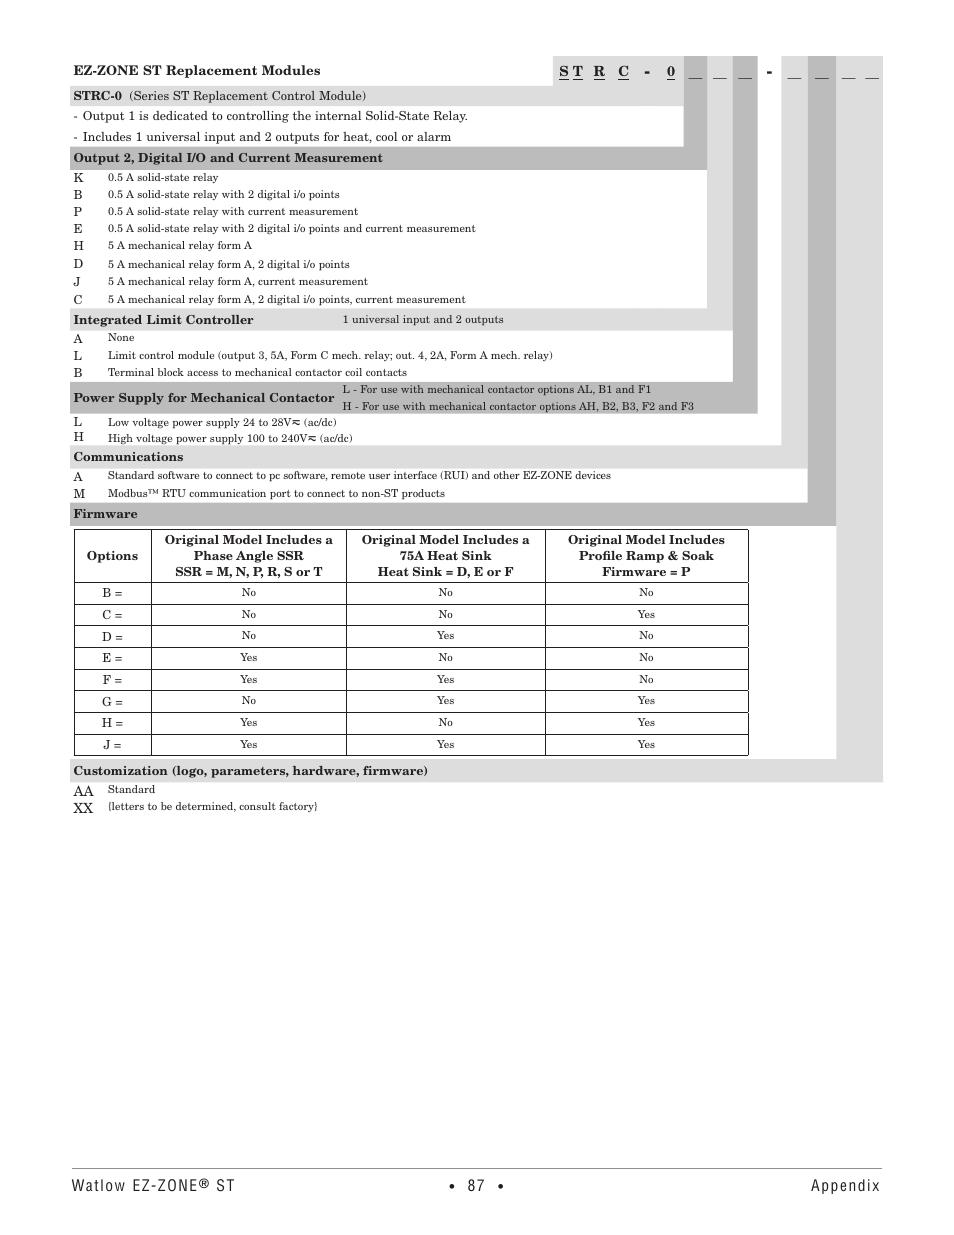 Watlow ez-zone, Appendix | Watlow EZ-ZONE ST User Manual | Page